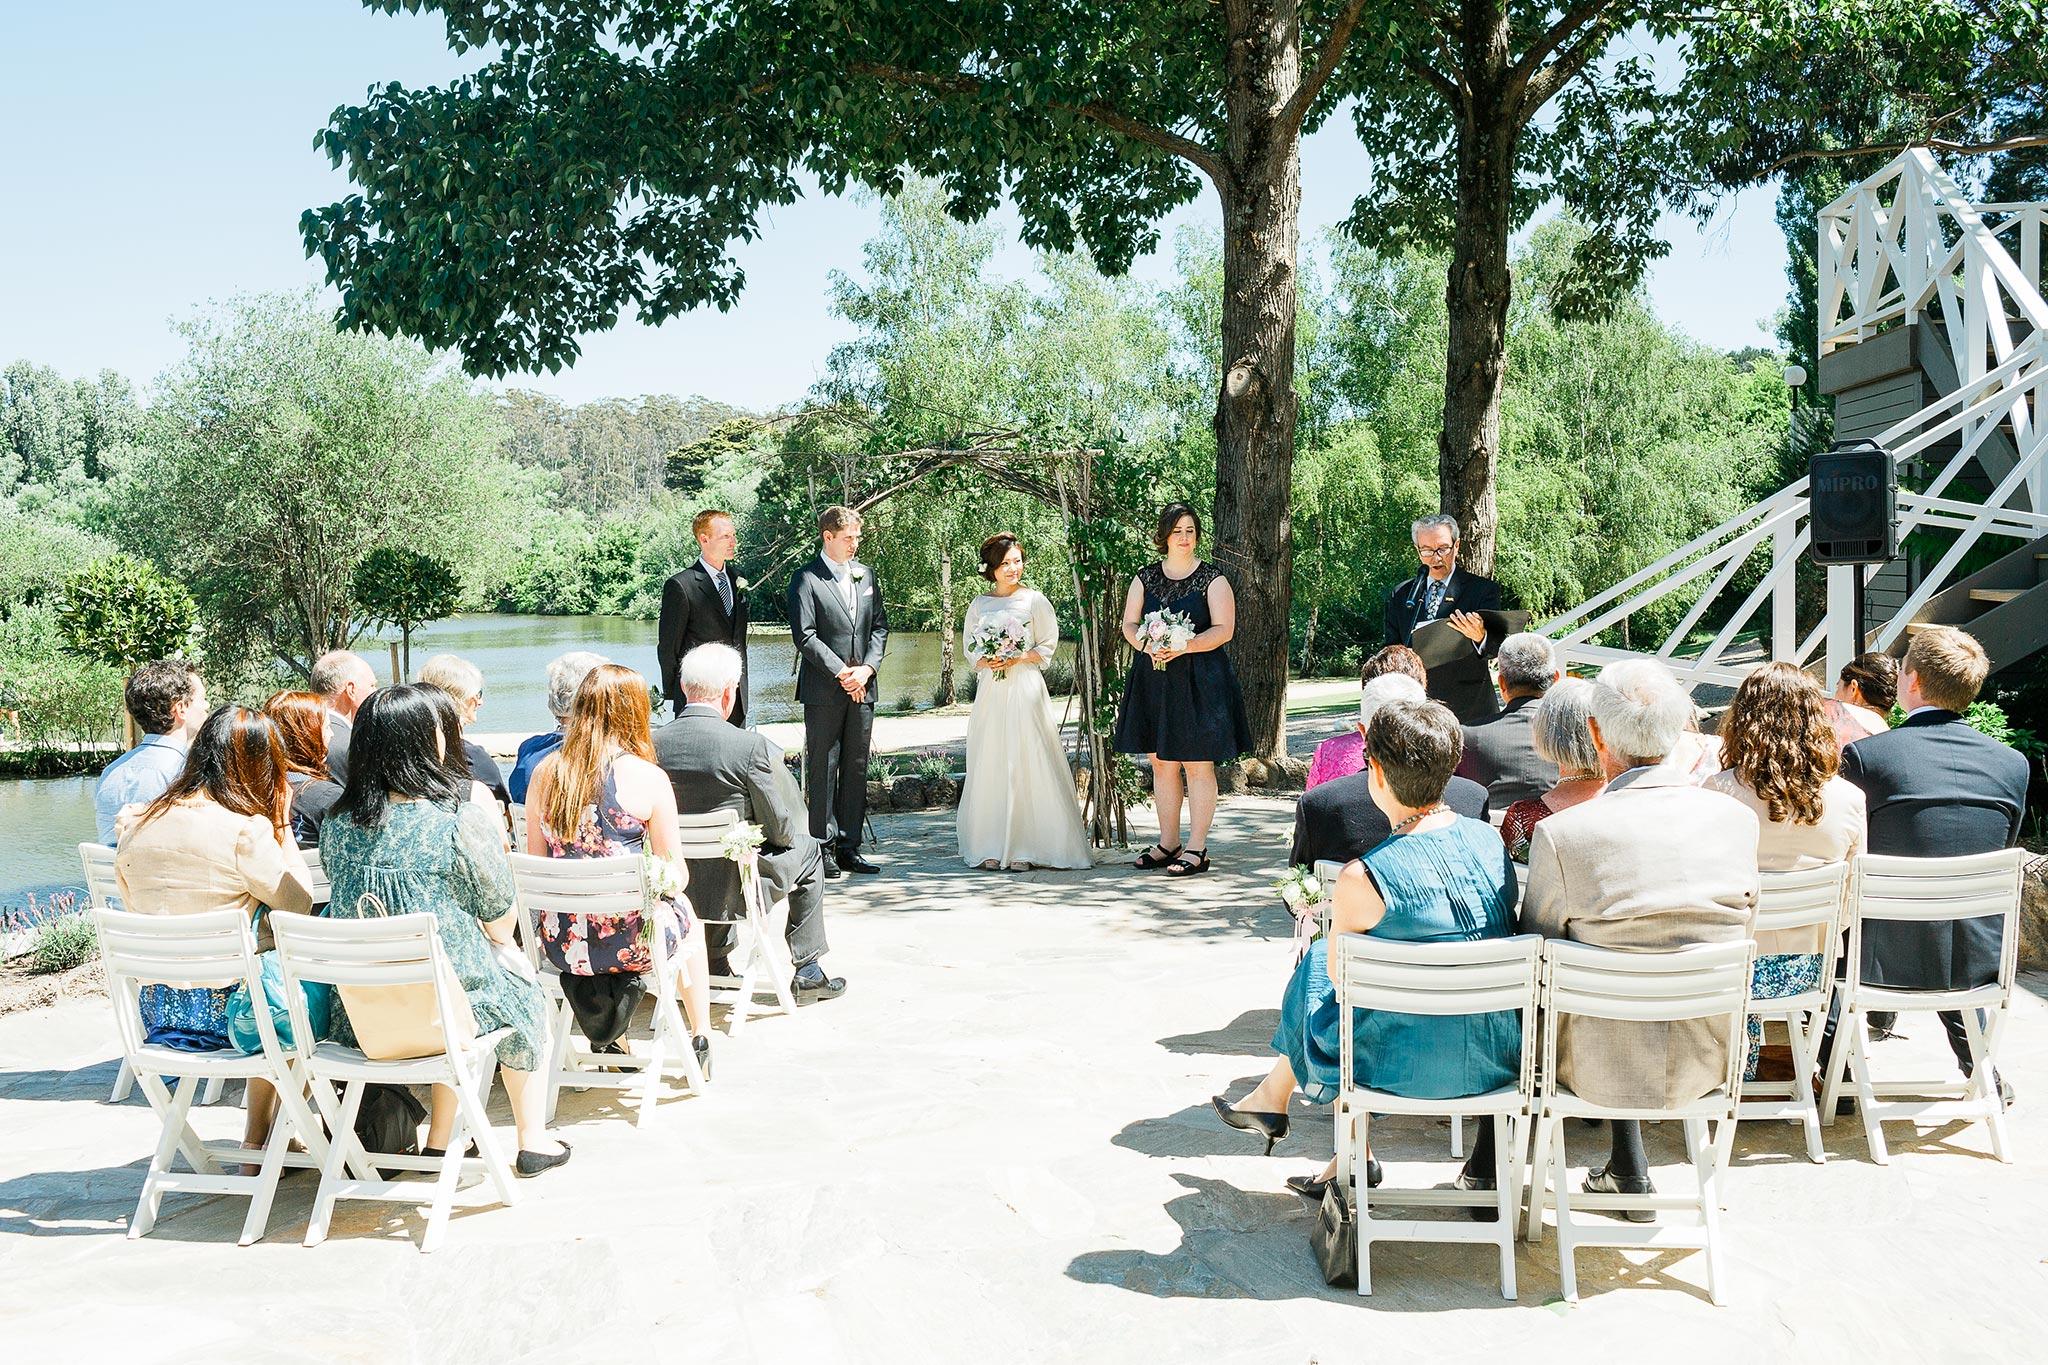 Daylesford-Lake-House-Wedding-Photographer-ceremony